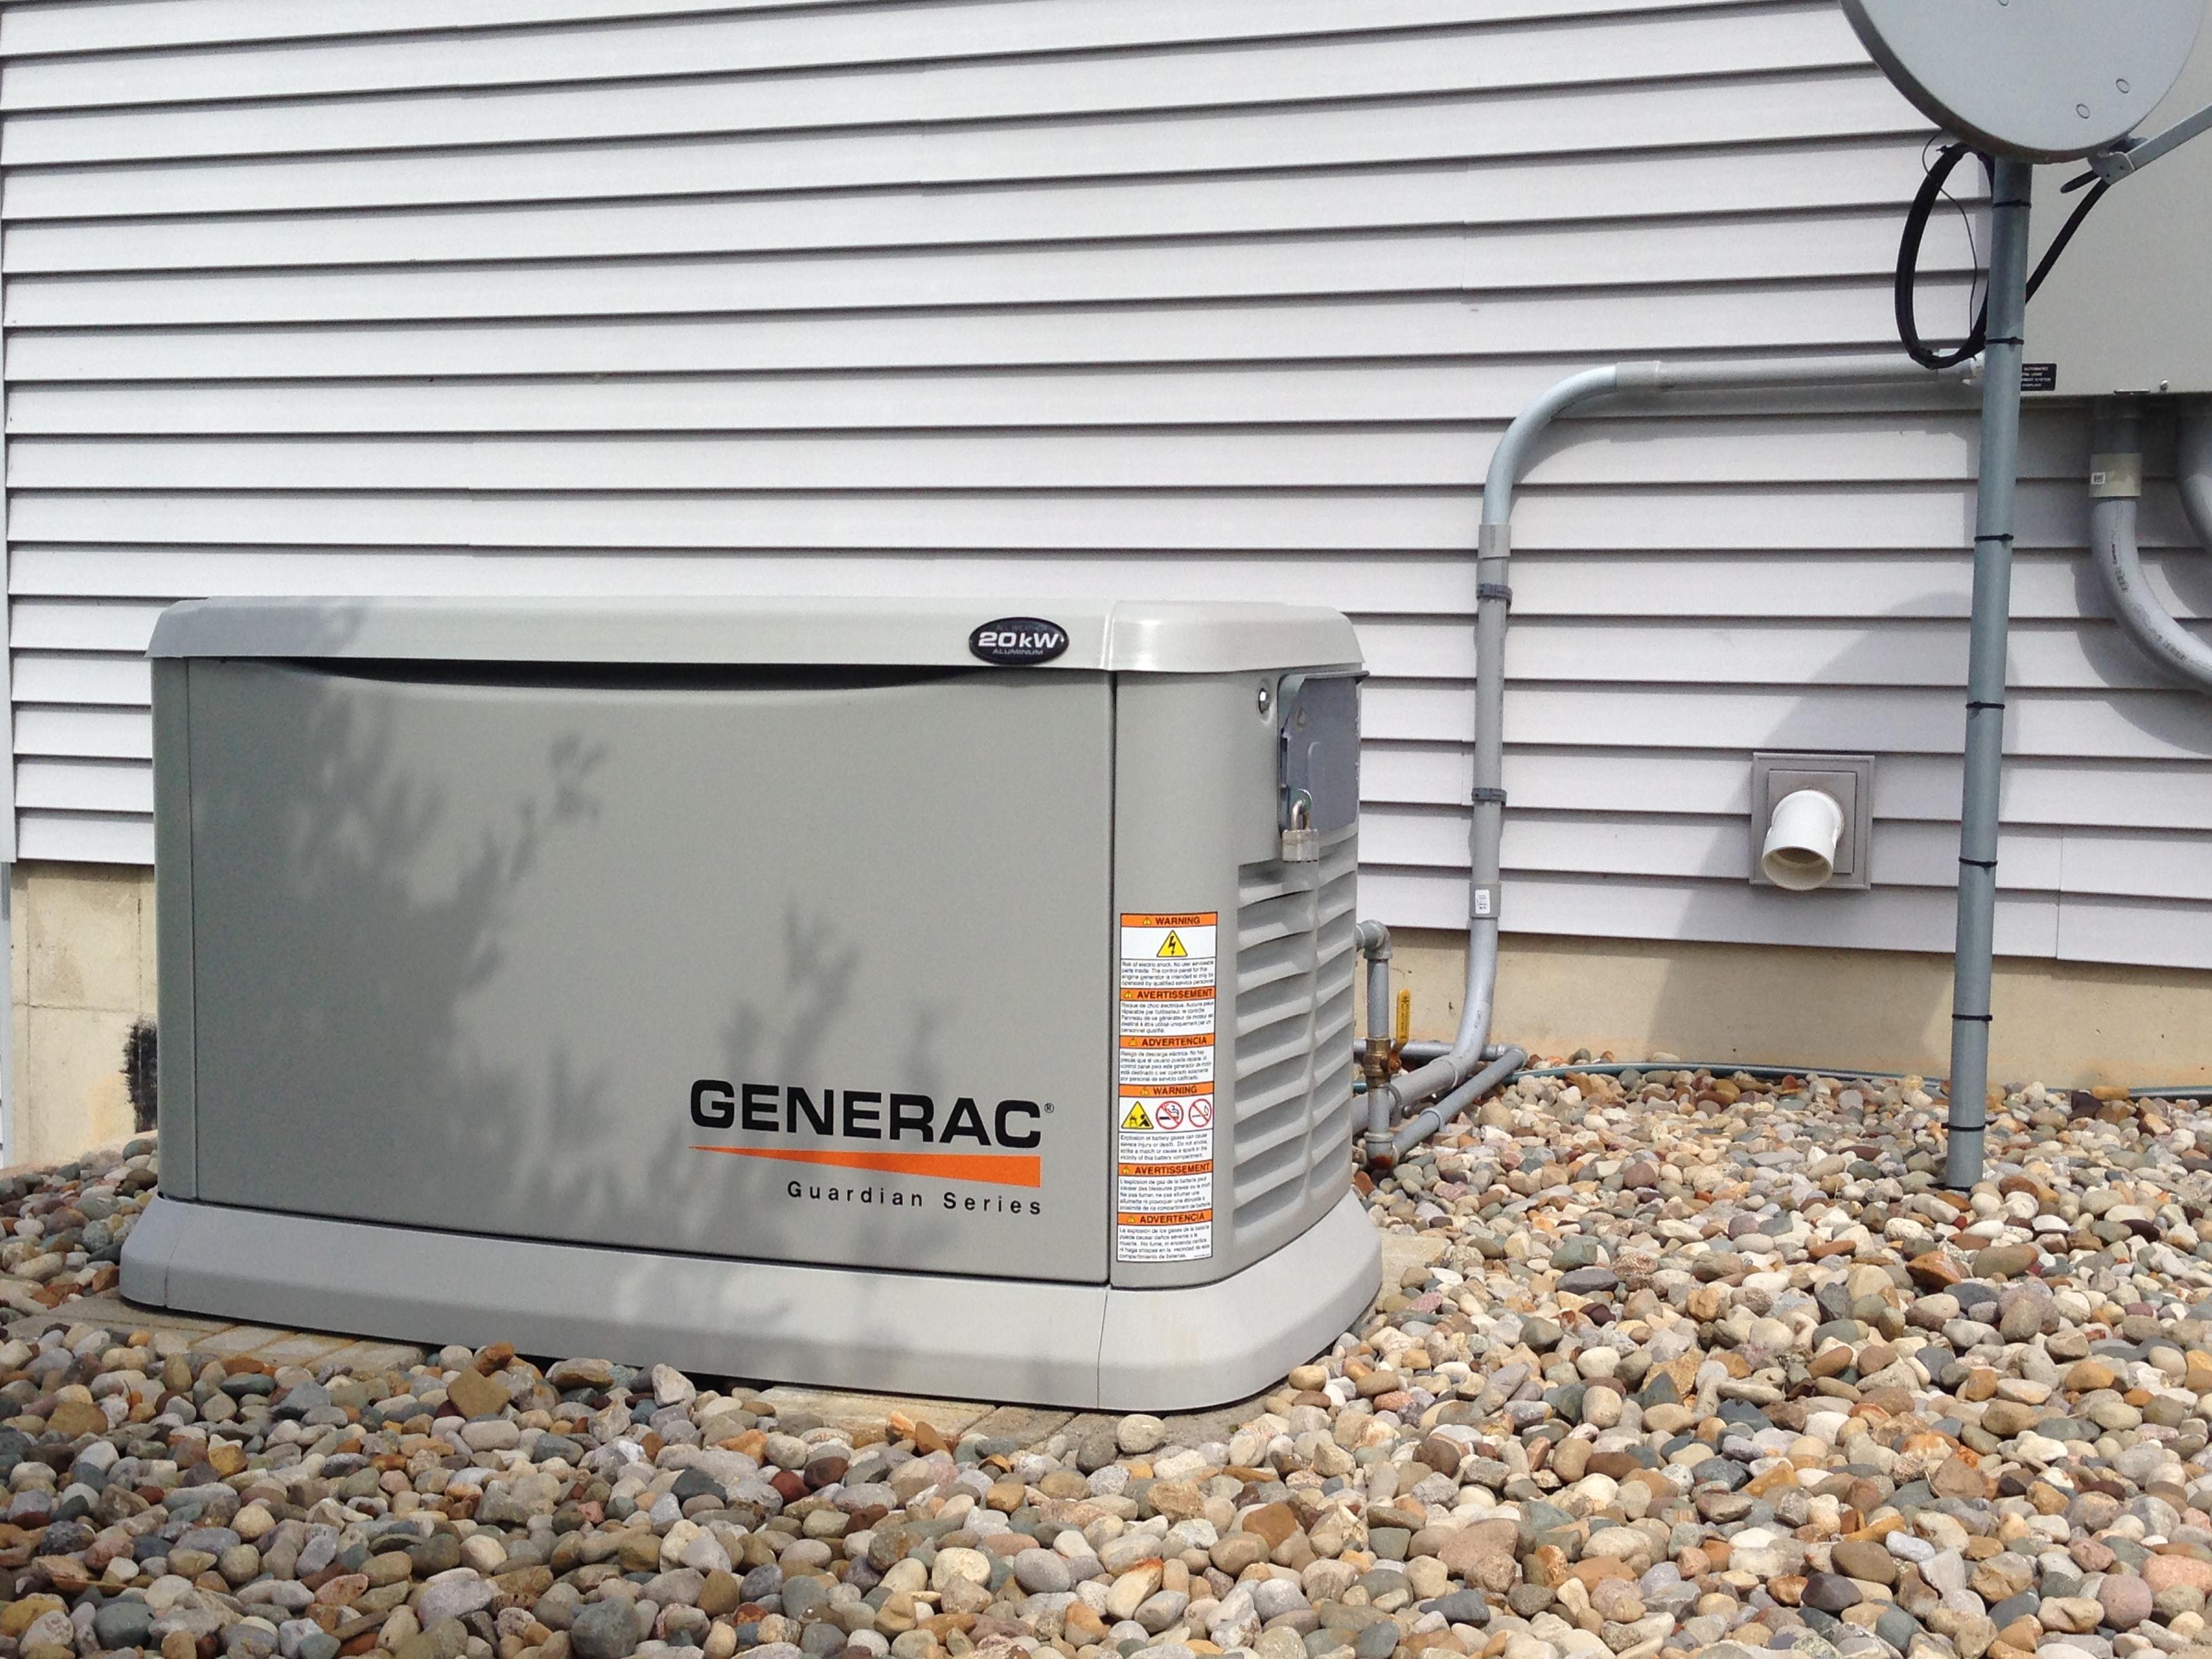 Generac Standby Power Generator Installation